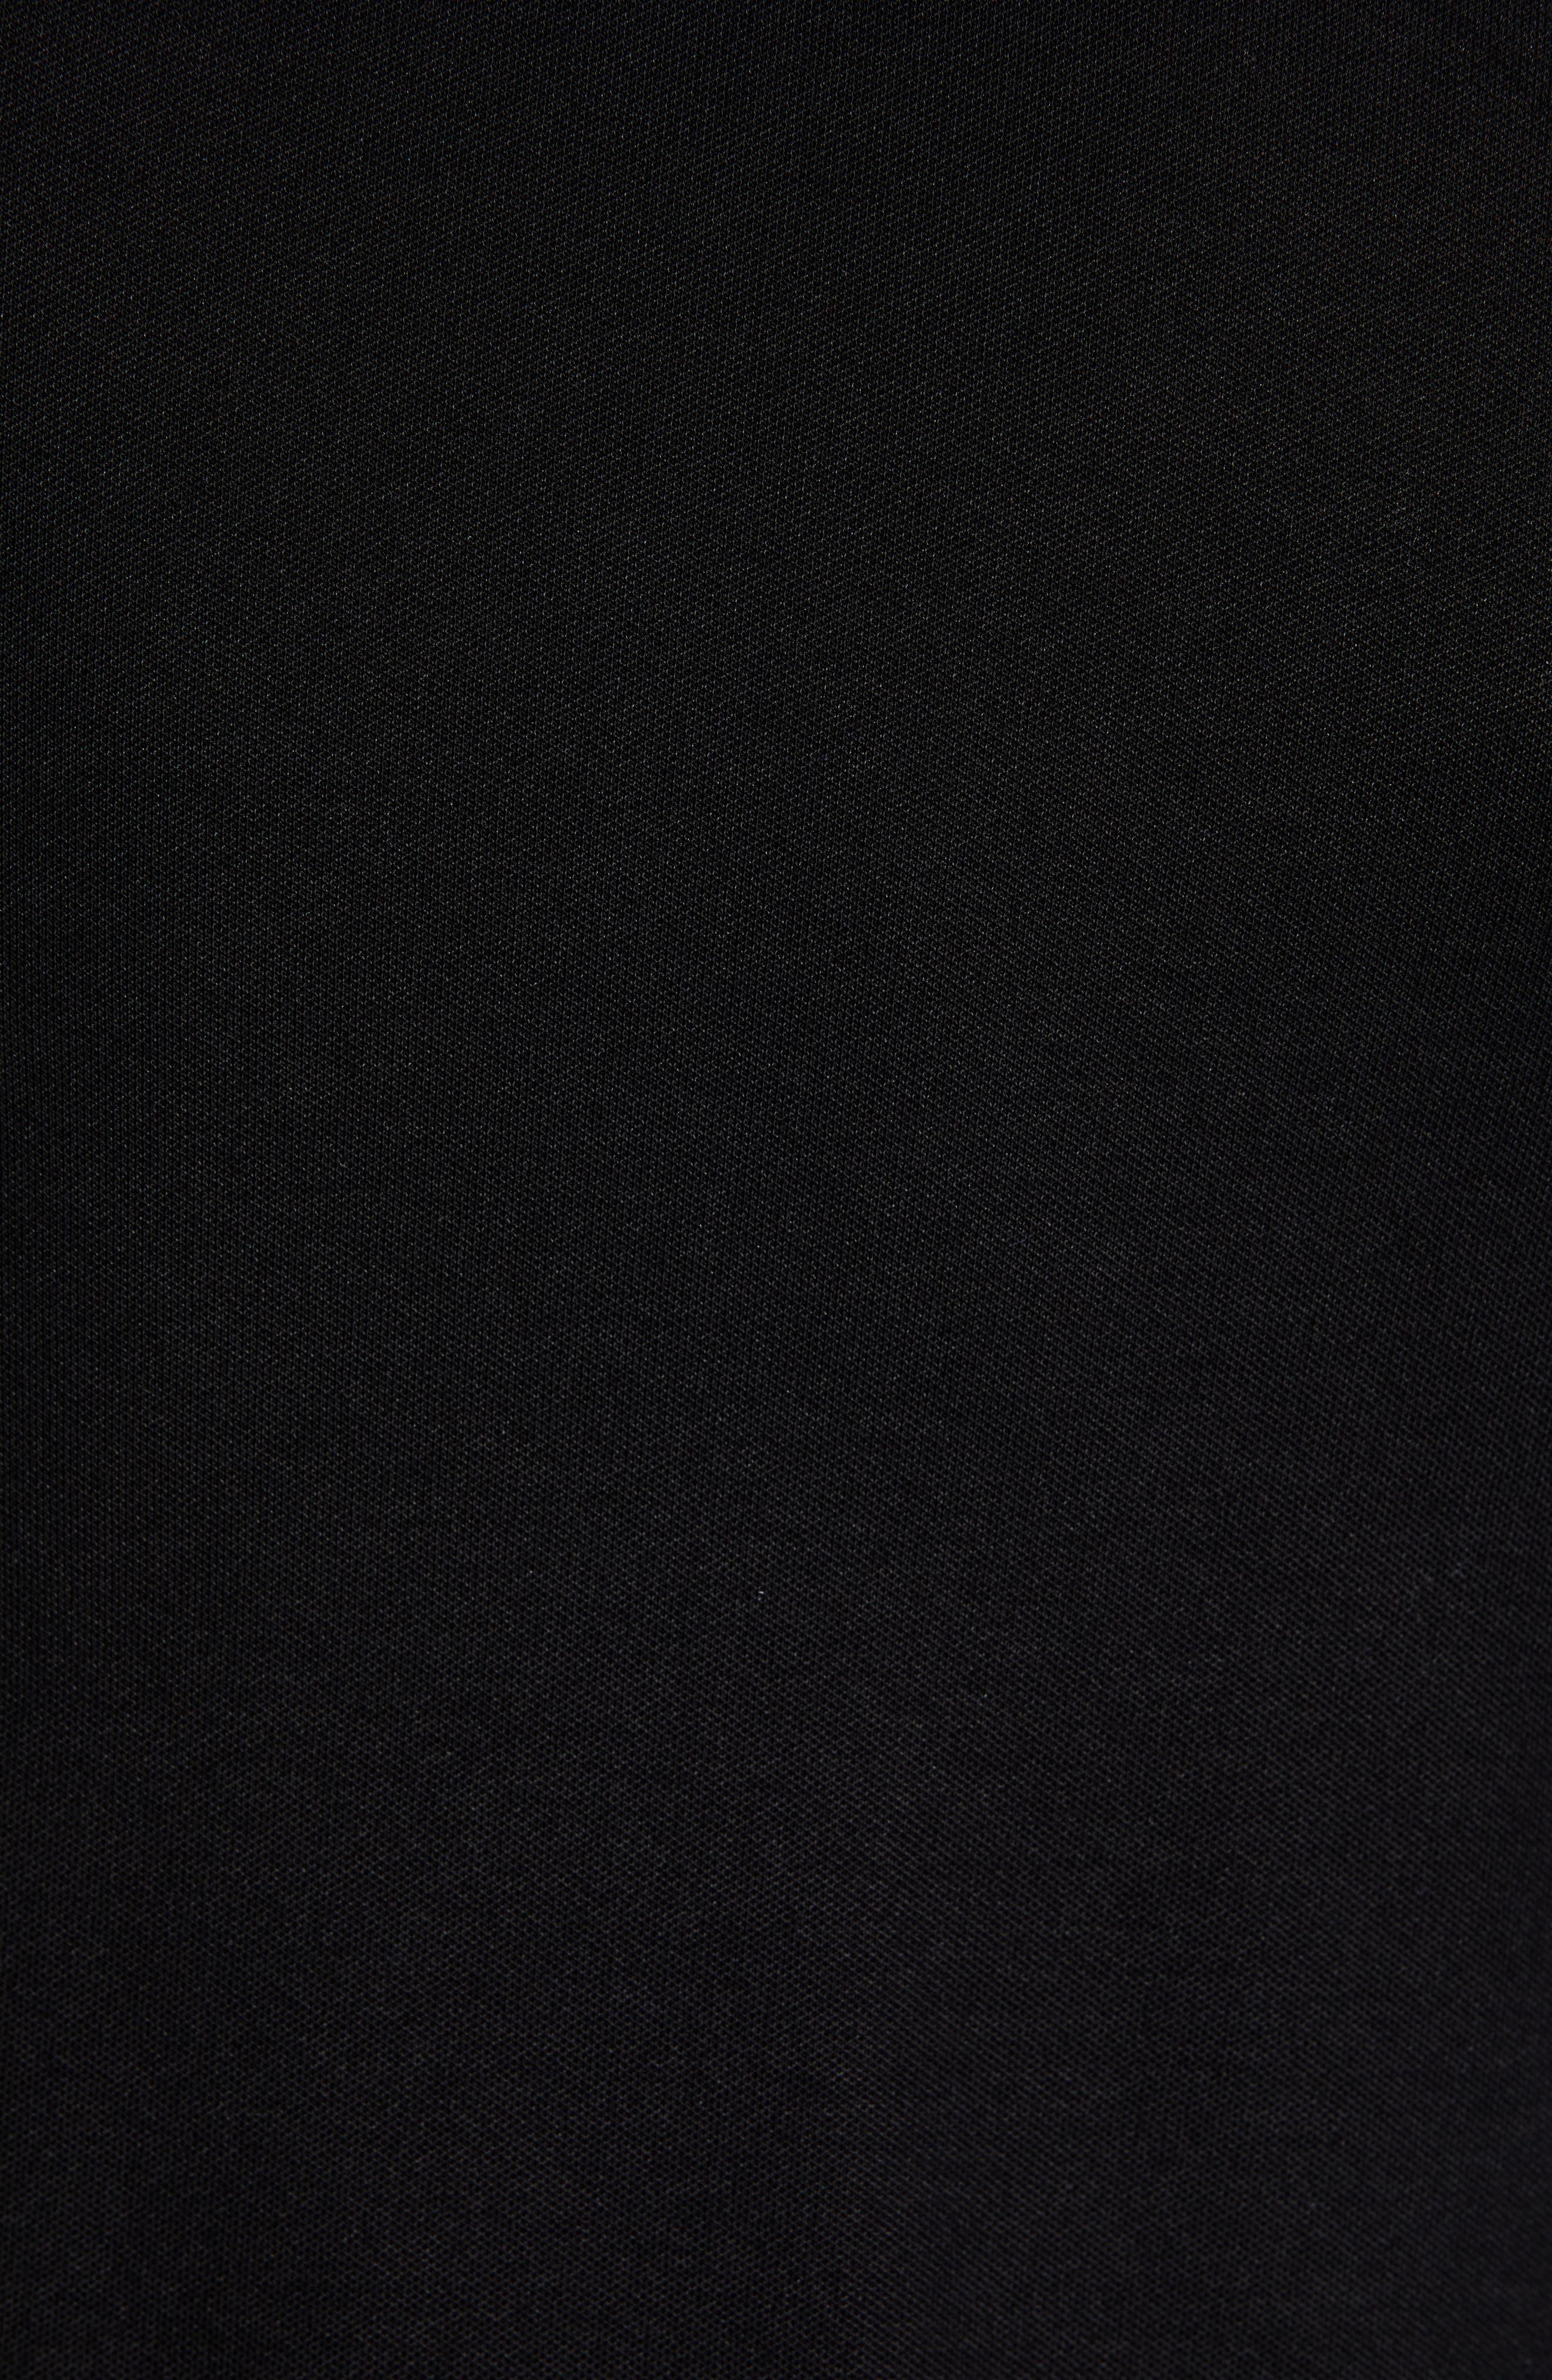 Paule Slim Fit Polo,                             Alternate thumbnail 5, color,                             BLACK